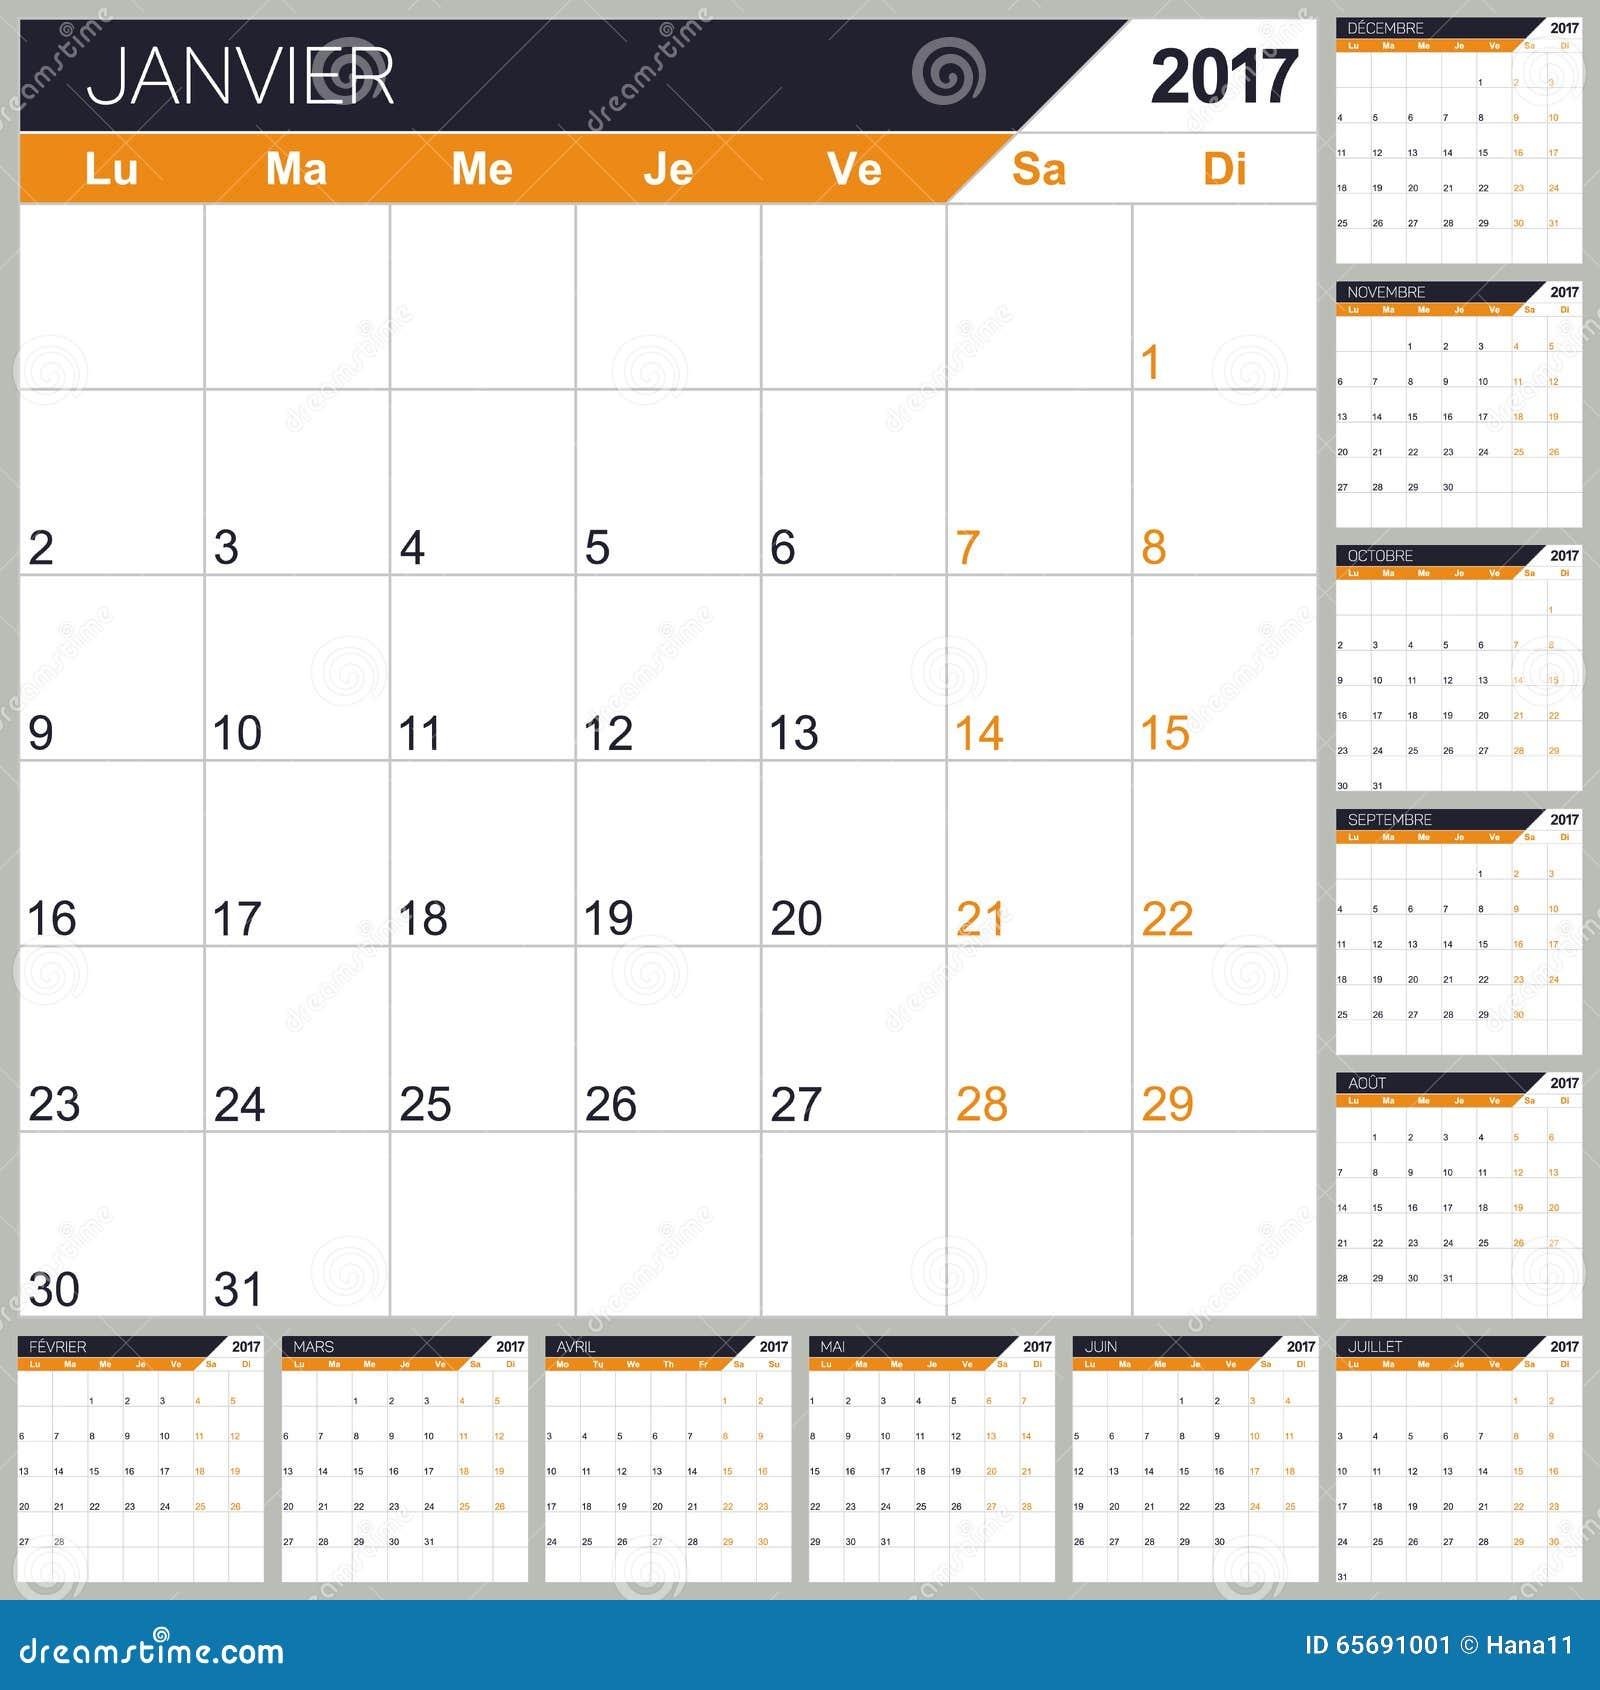 French Calendar 2017 Stock Vector Image 65691001